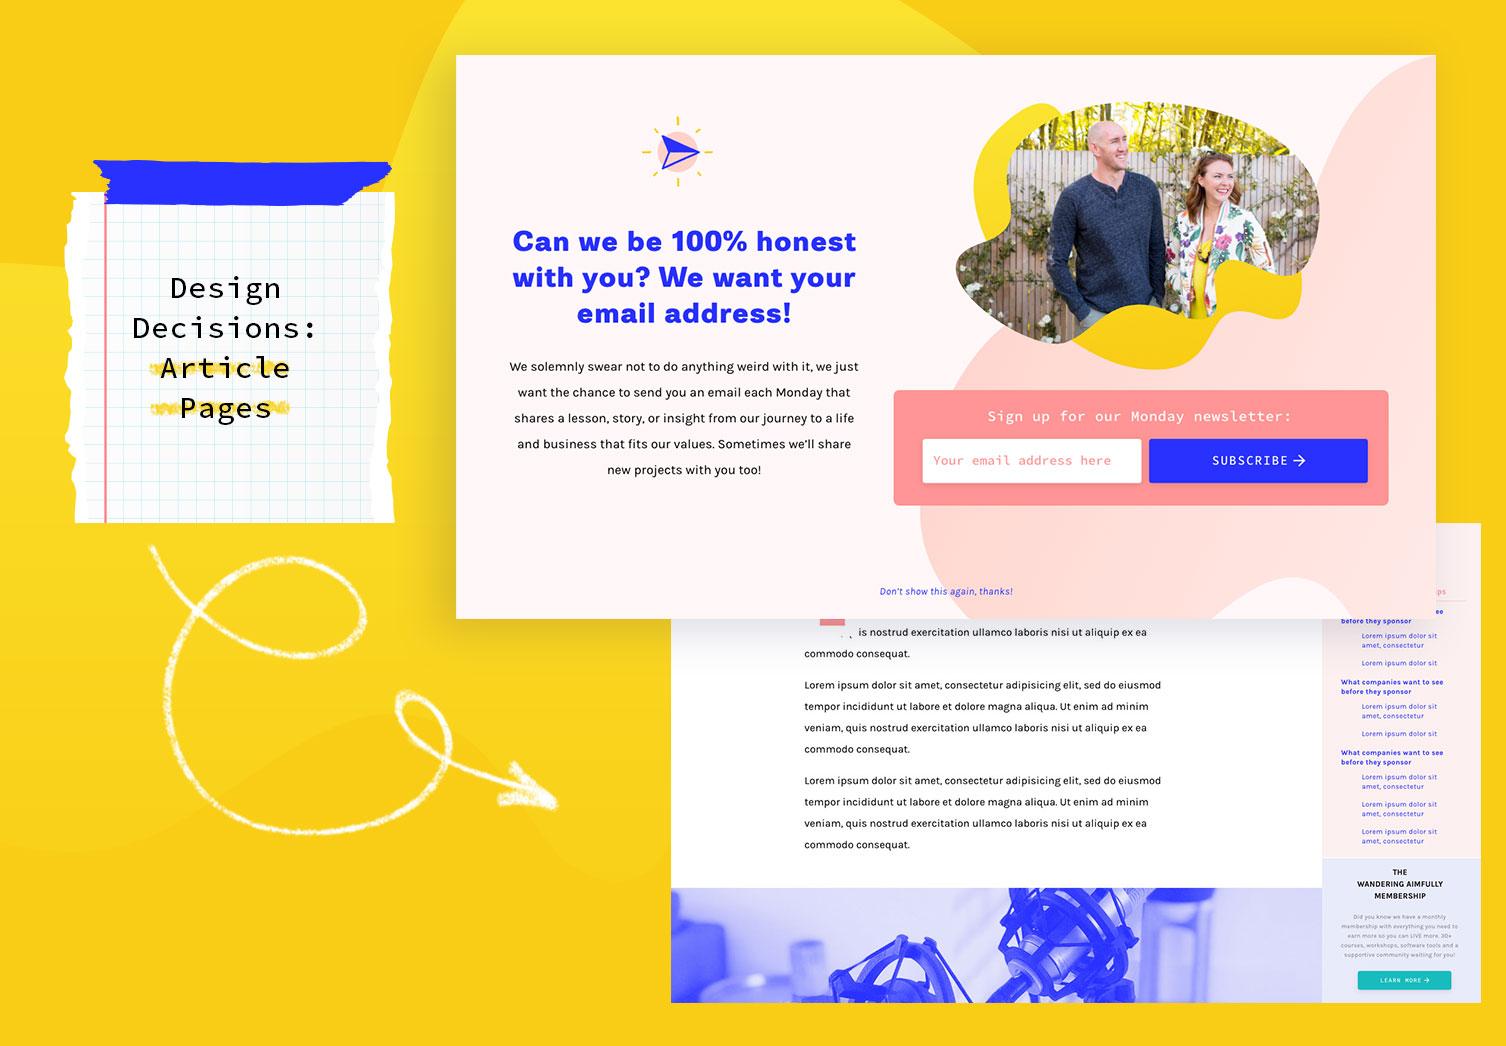 design-decisions-header-2.jpg